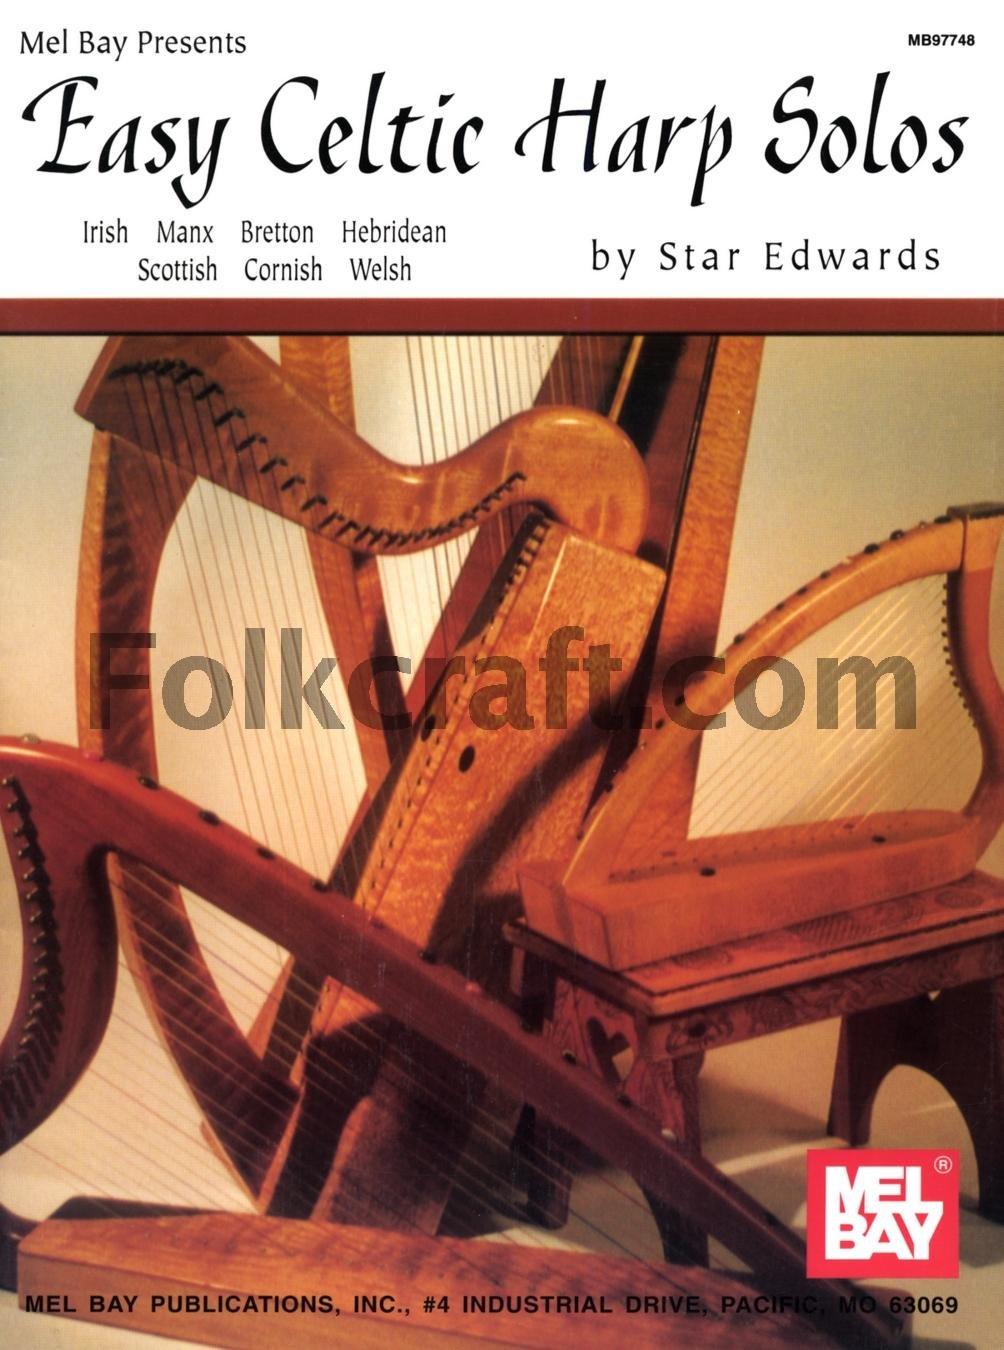 Easy Celtic Harp Solos Mel Bay Publications